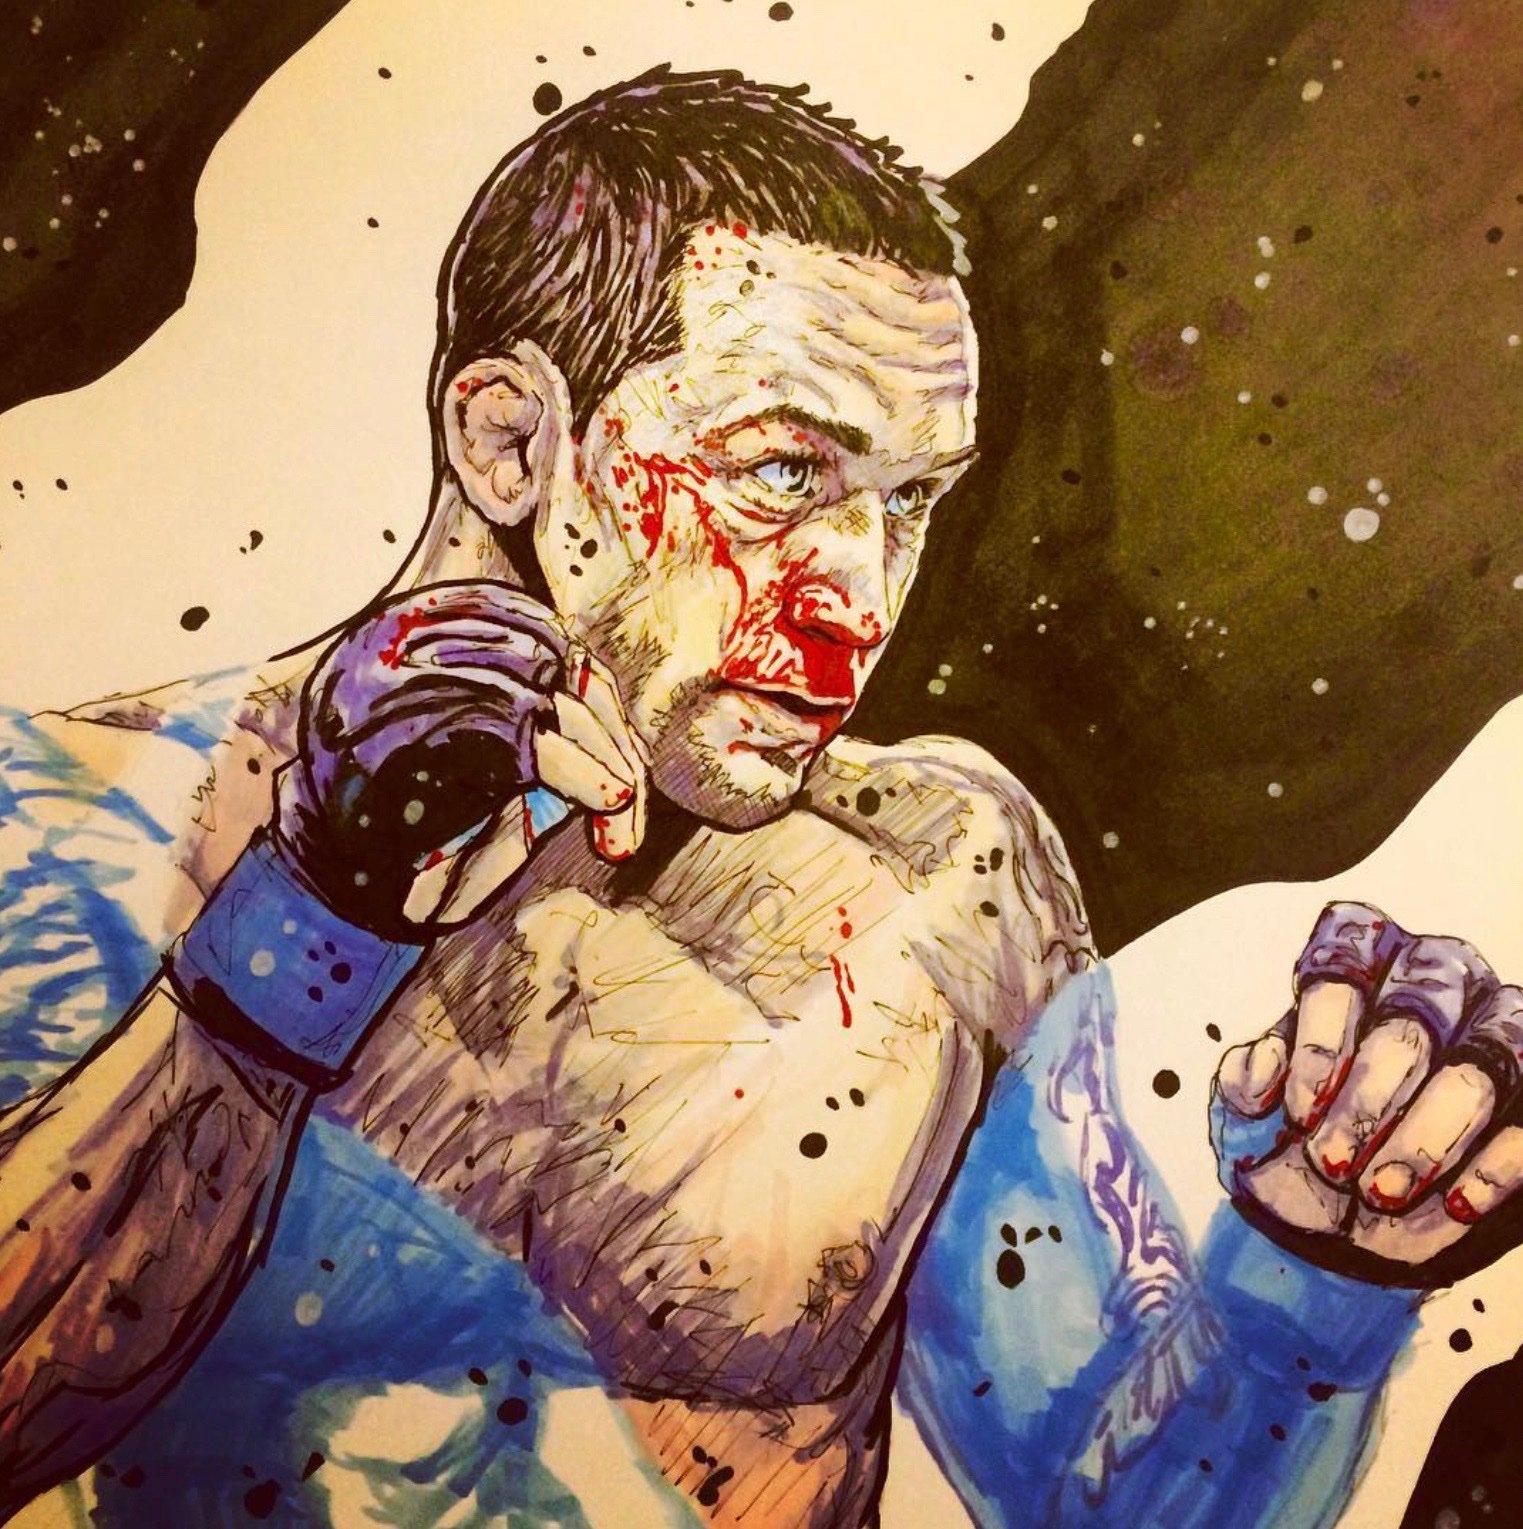 🔥 Team Edgar 🔥 Art by @GorillaTheBear #UFC #MMA #WMMA #TeamMMA4LIFE #PeoplesMMA #FrankieEdgar #UFC240 https://t.co/WhyohuPQrG